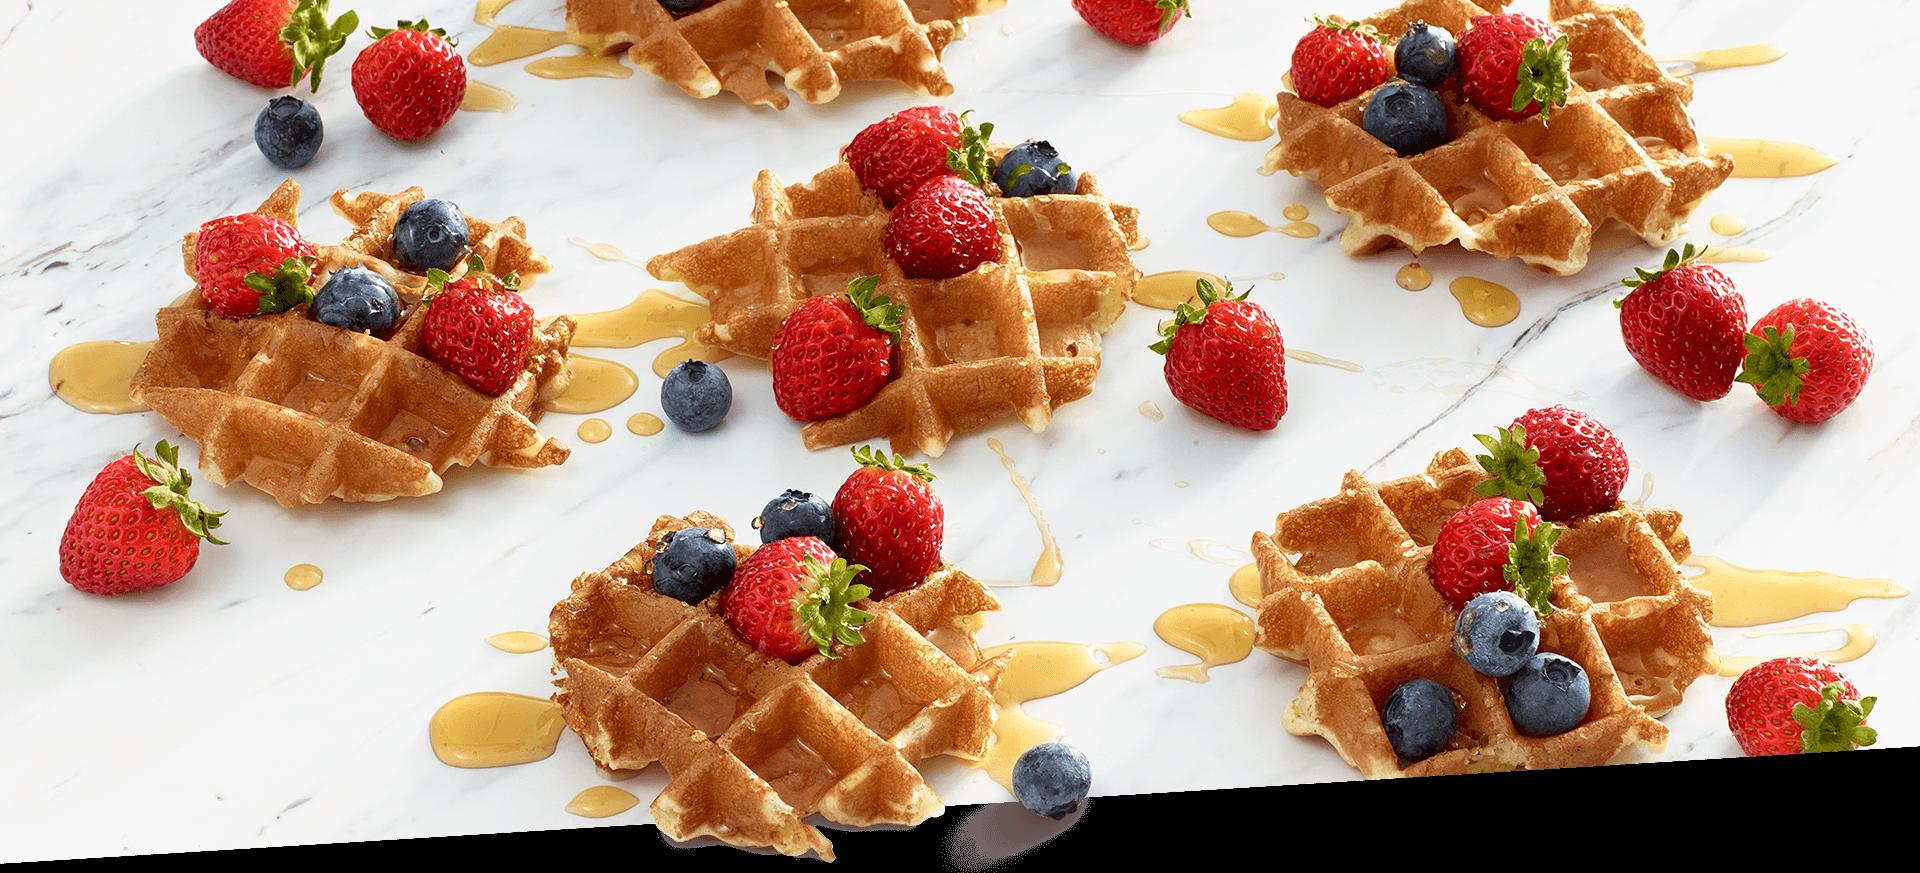 teeny tiny smuccies belgian waffles header img